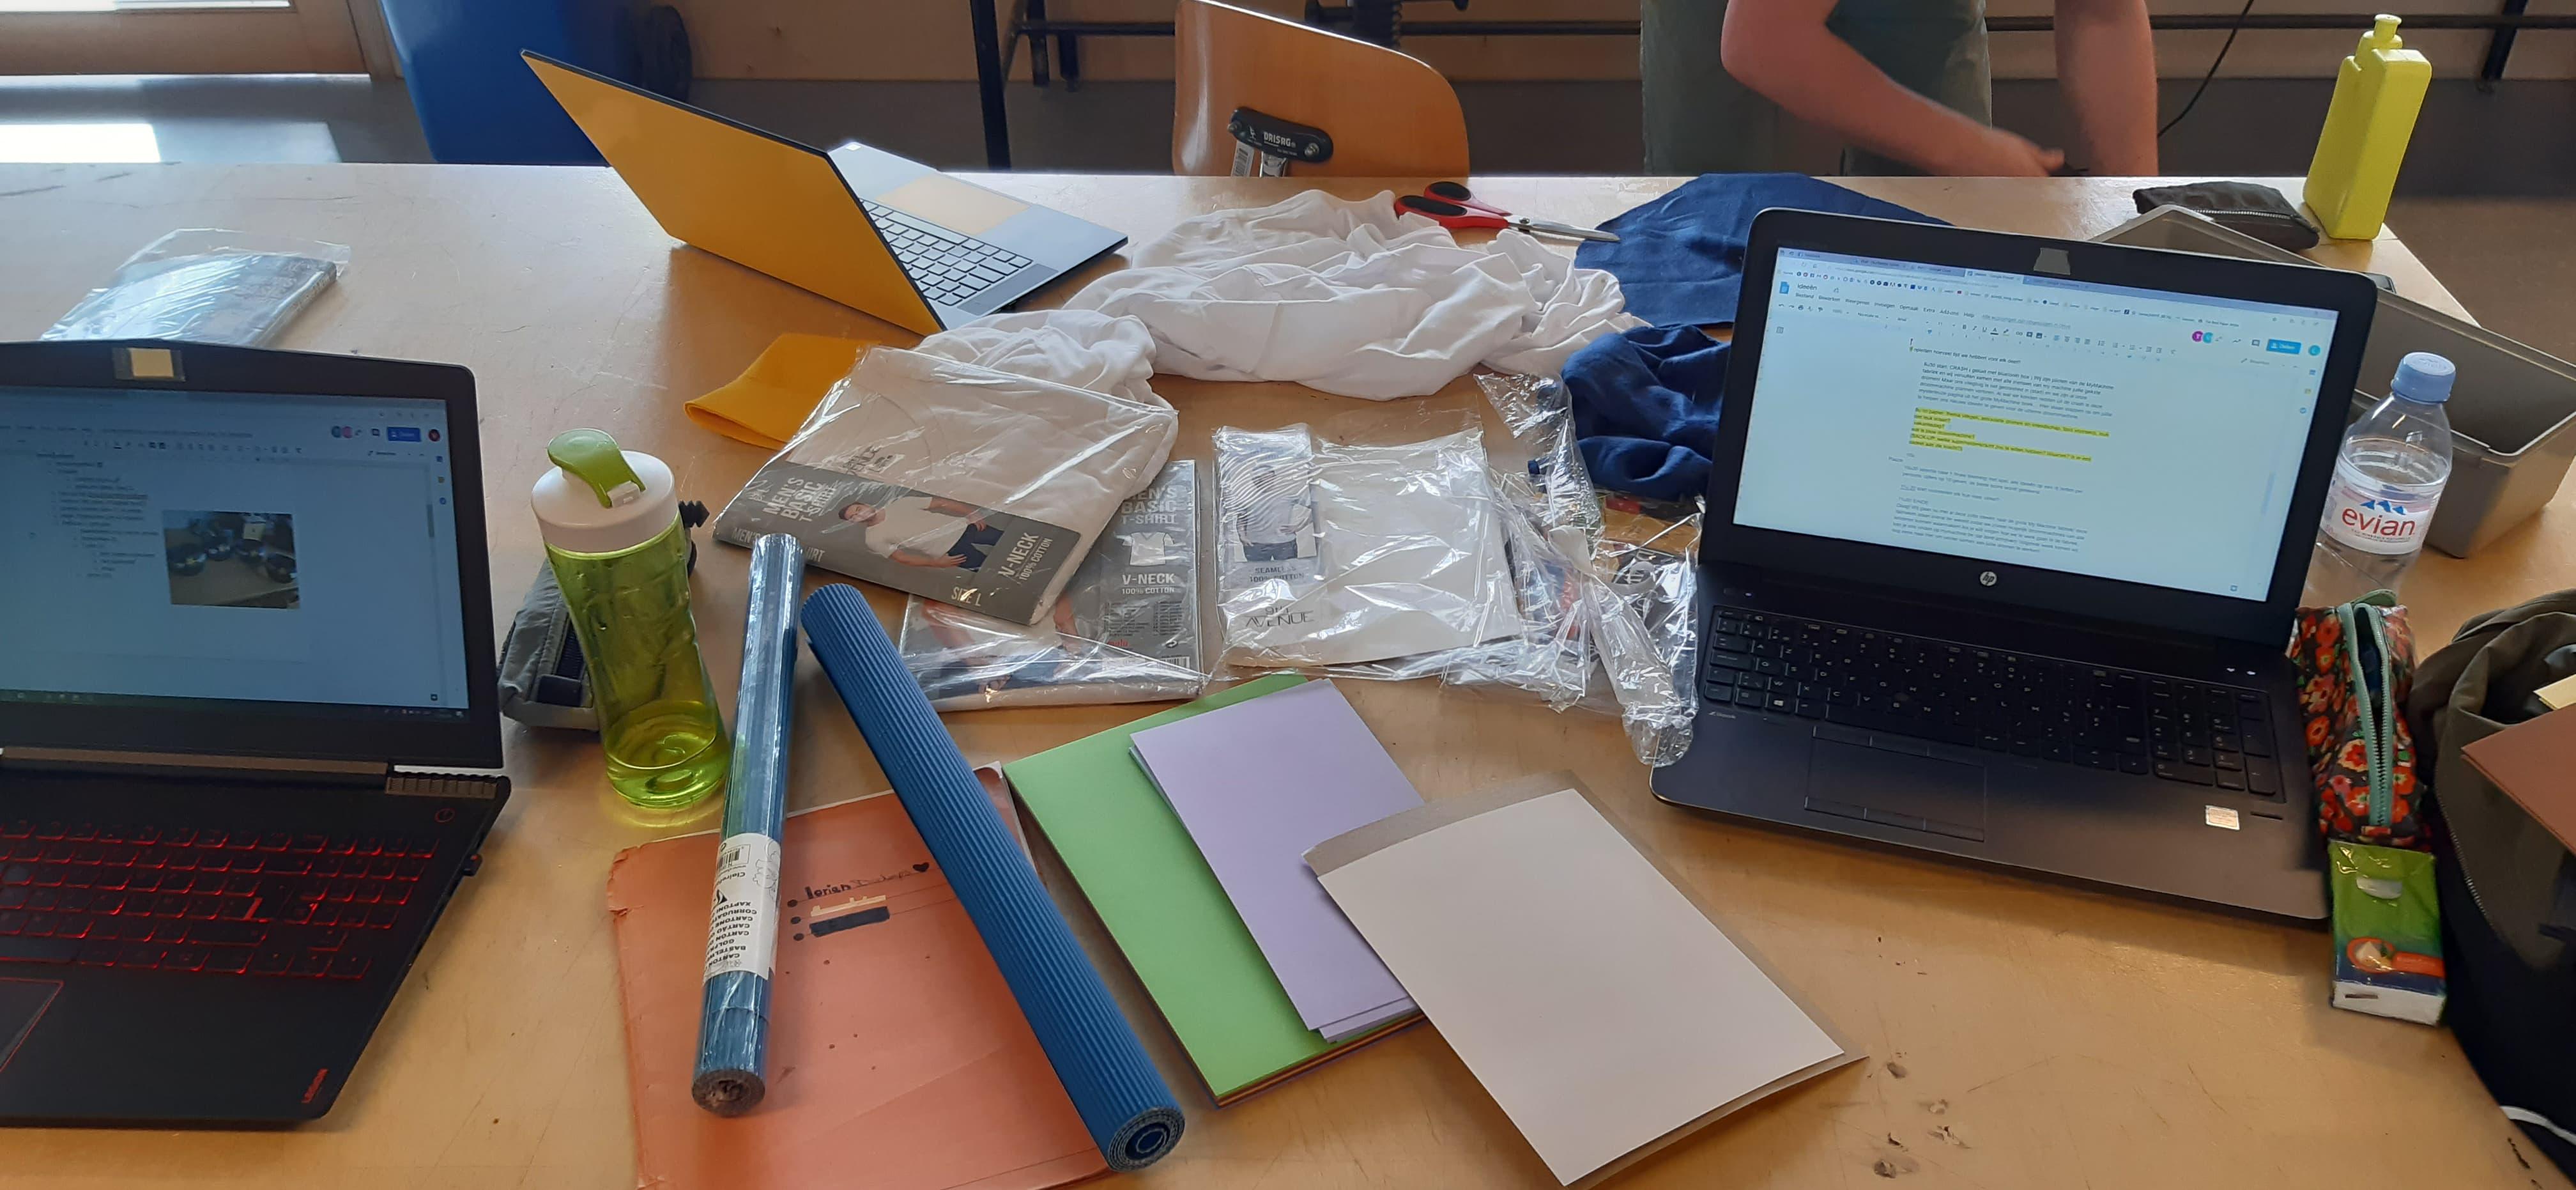 Voorbereiding creativiteitssessie